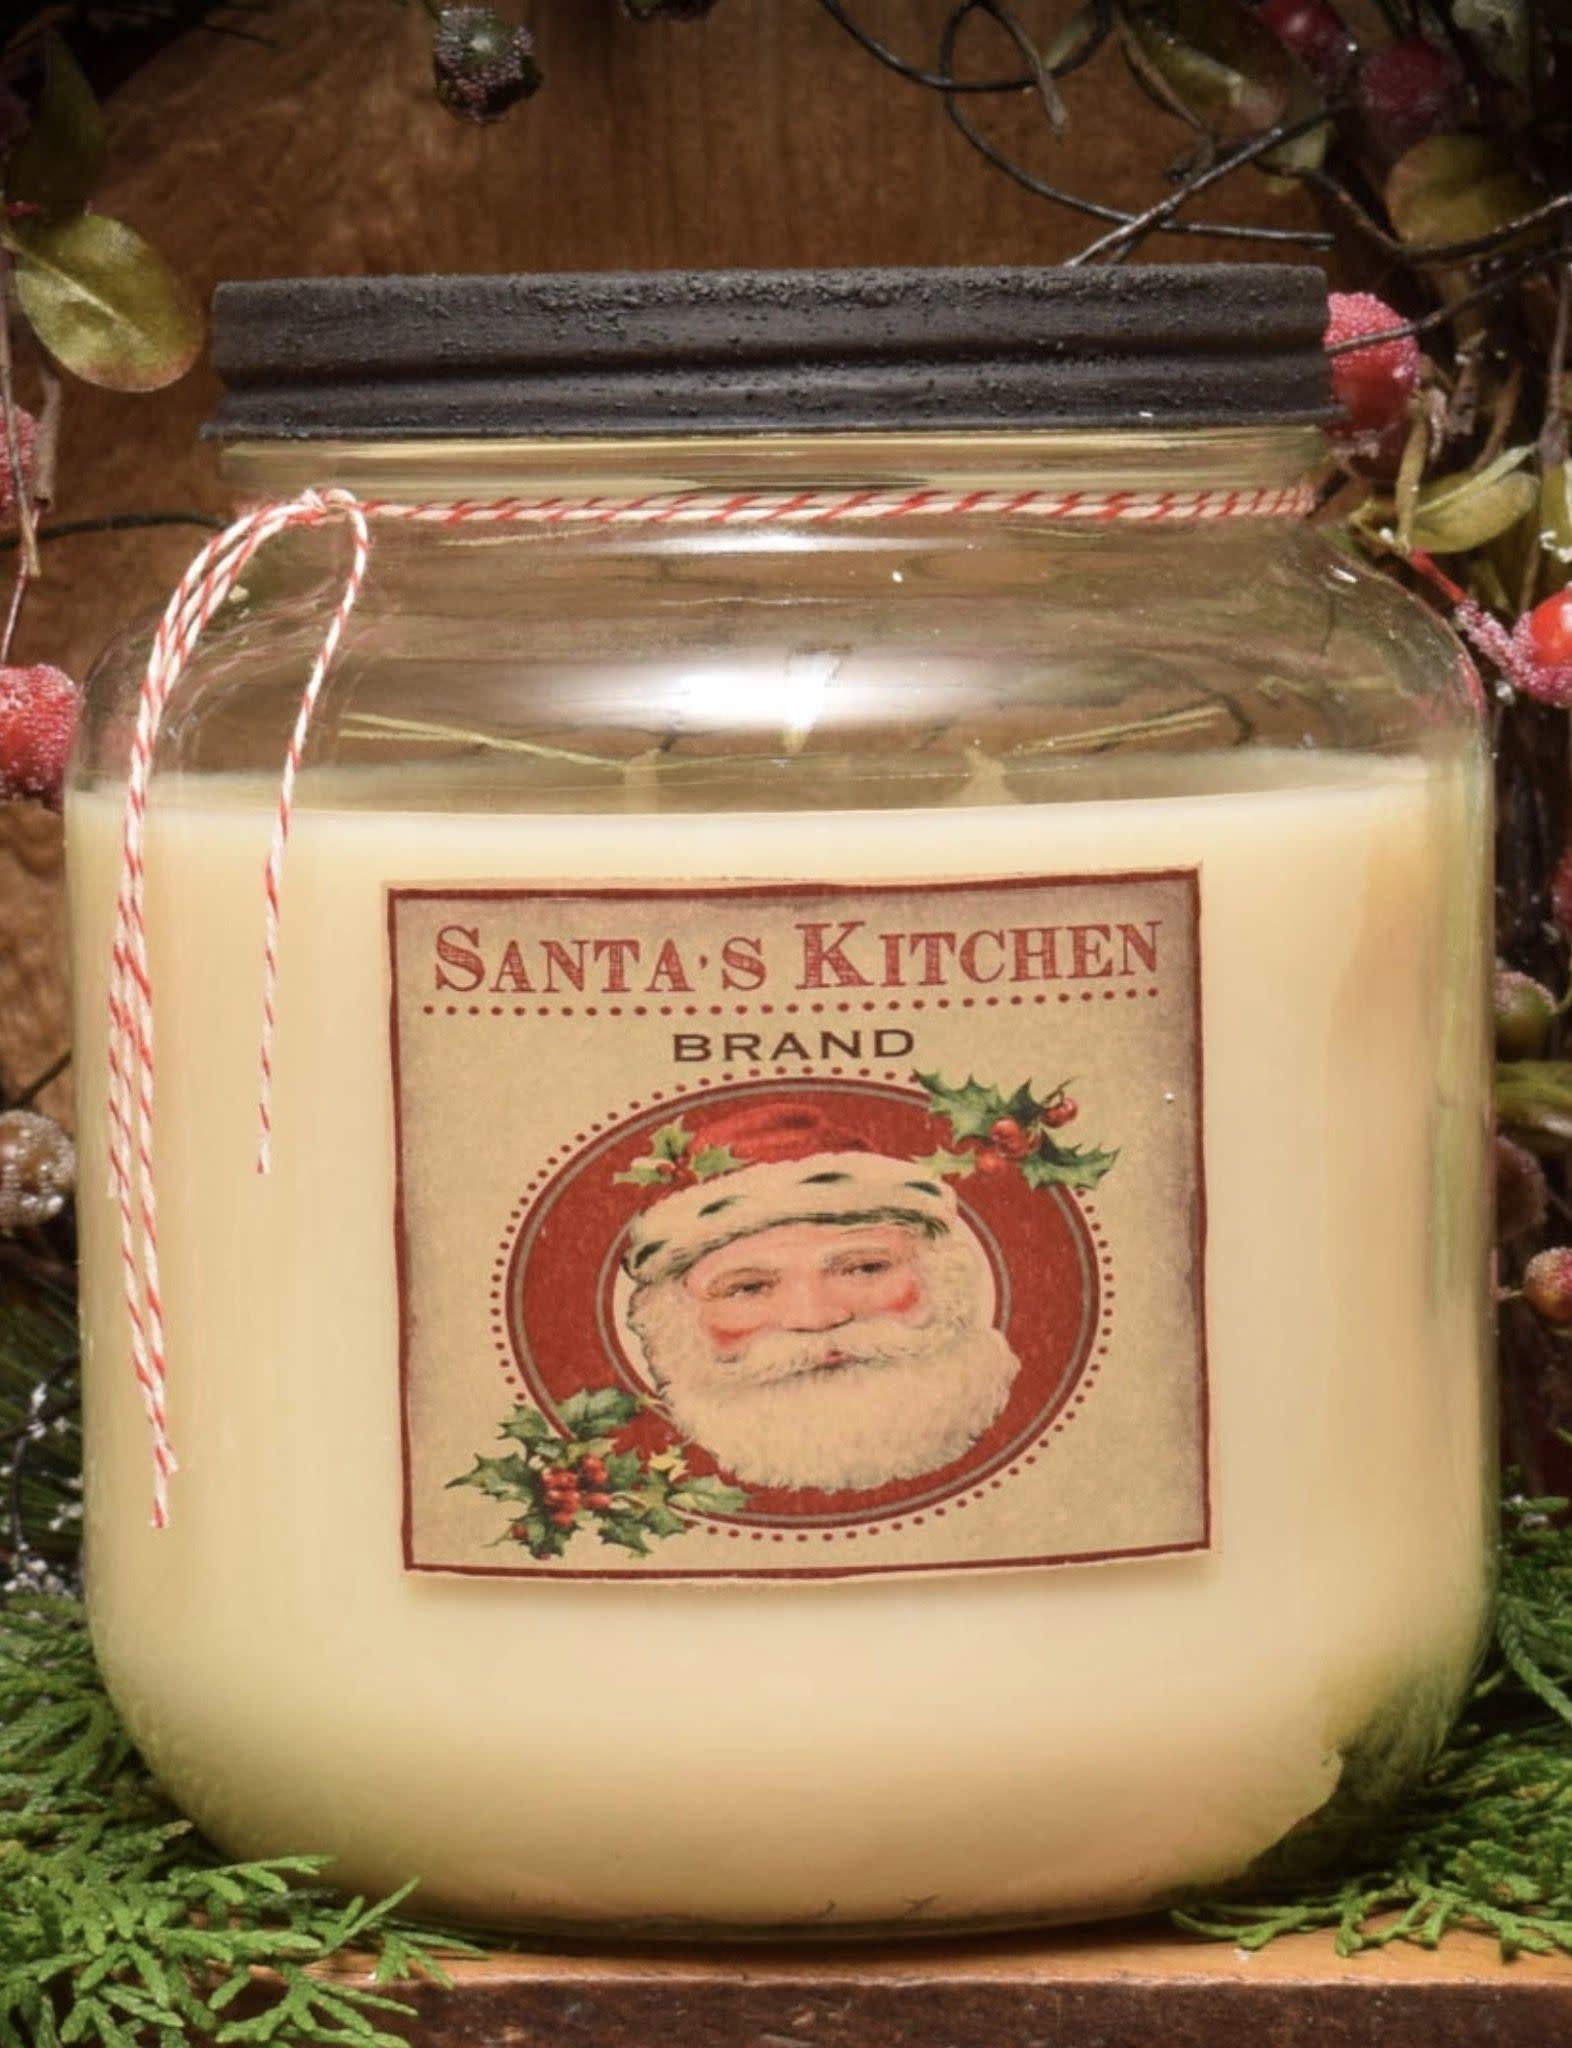 Herbal Star Candles Cinnamon Spice Cookies Soy Jar Candle - 64oz